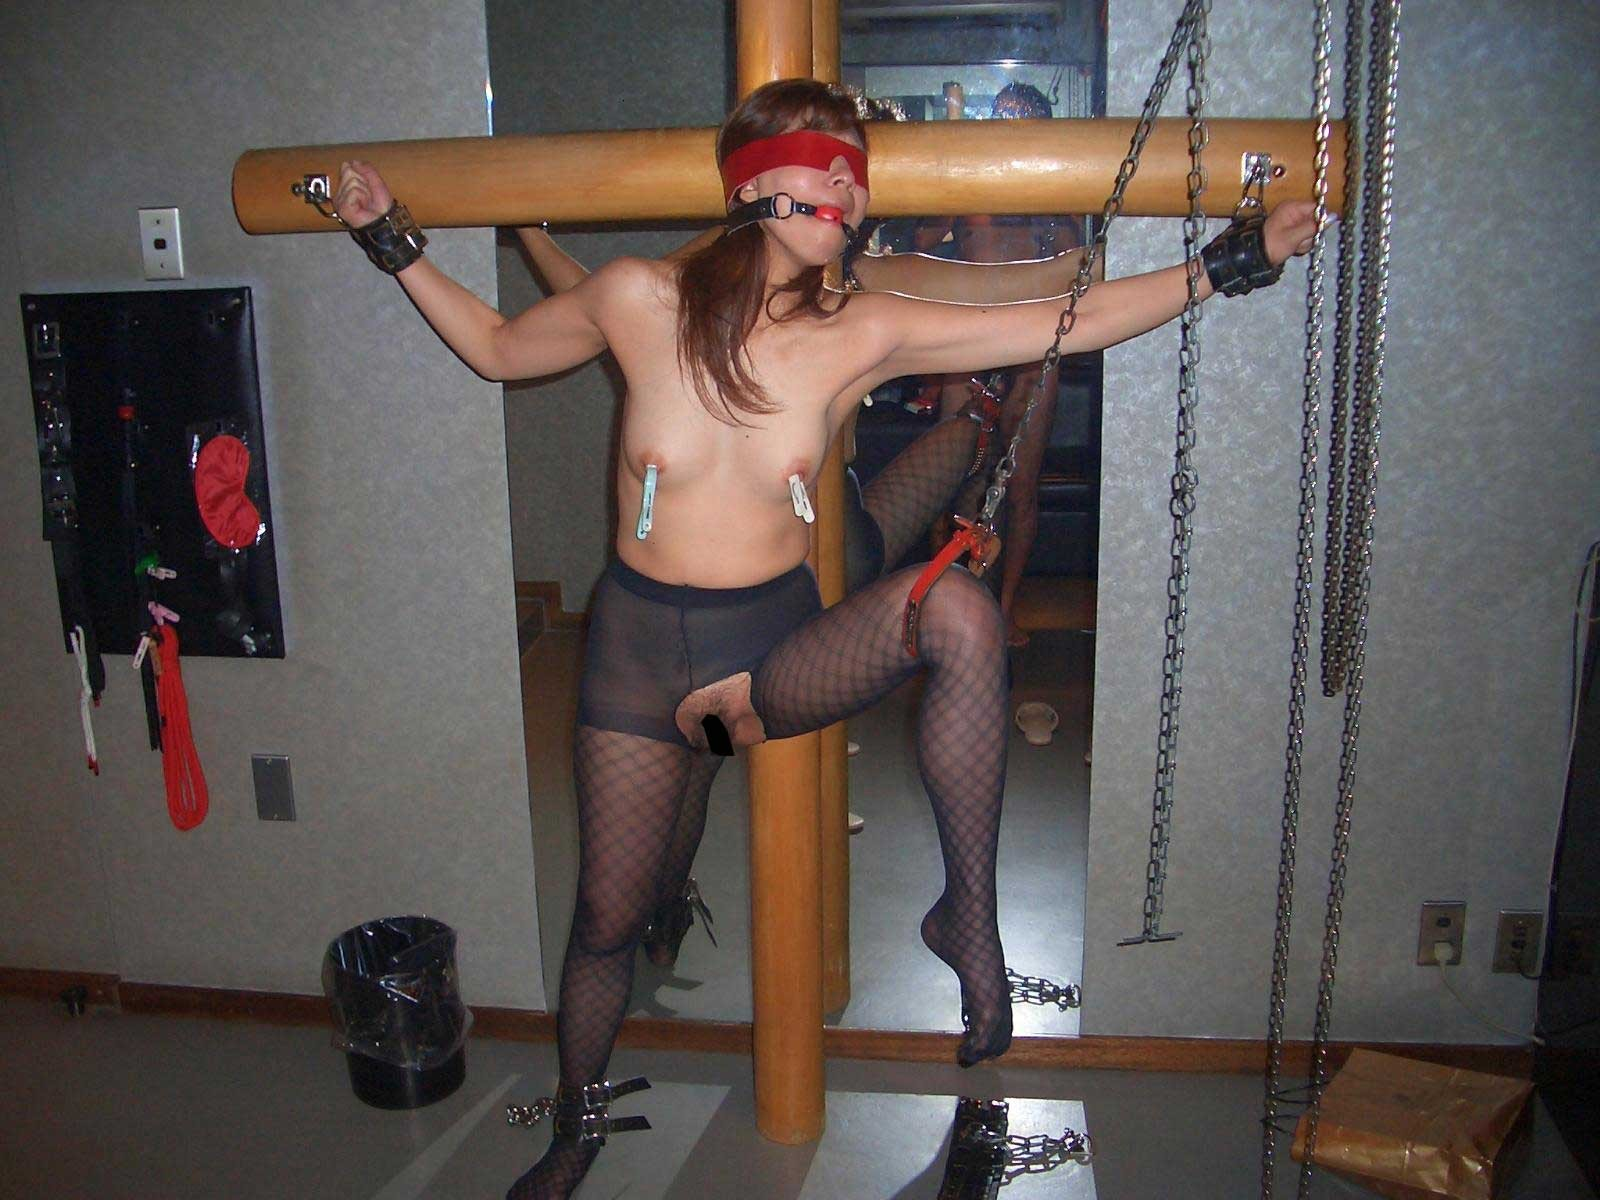 【SM画像】責めてもよし、放置でもよしwww磔にされたM女画像 03